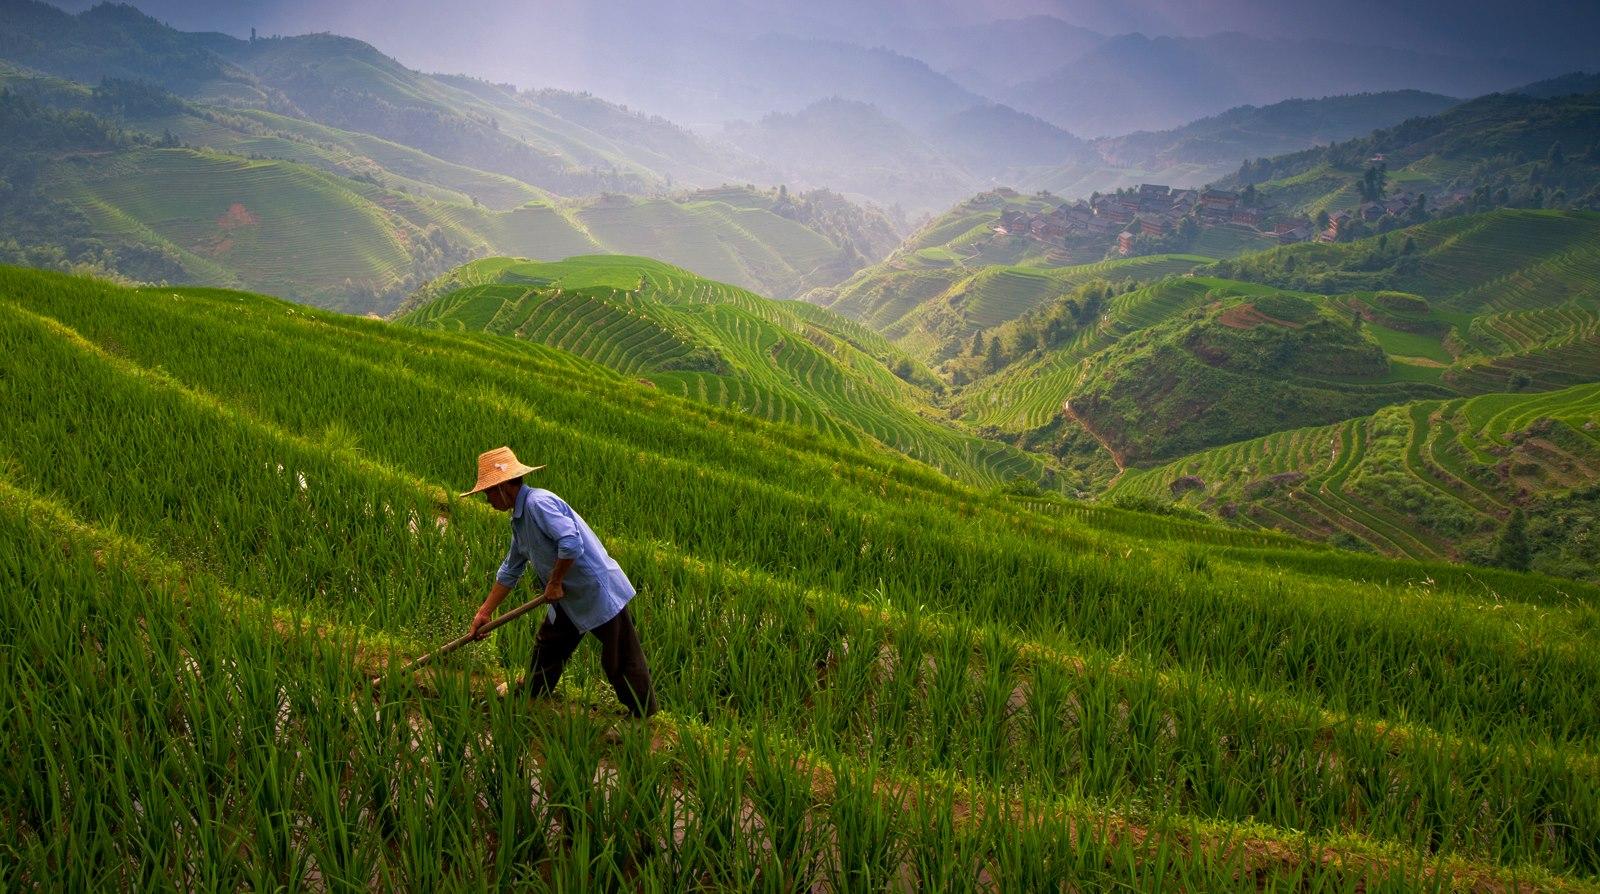 Terrazas de arroz en Guilin, China. Autor, Jesse E